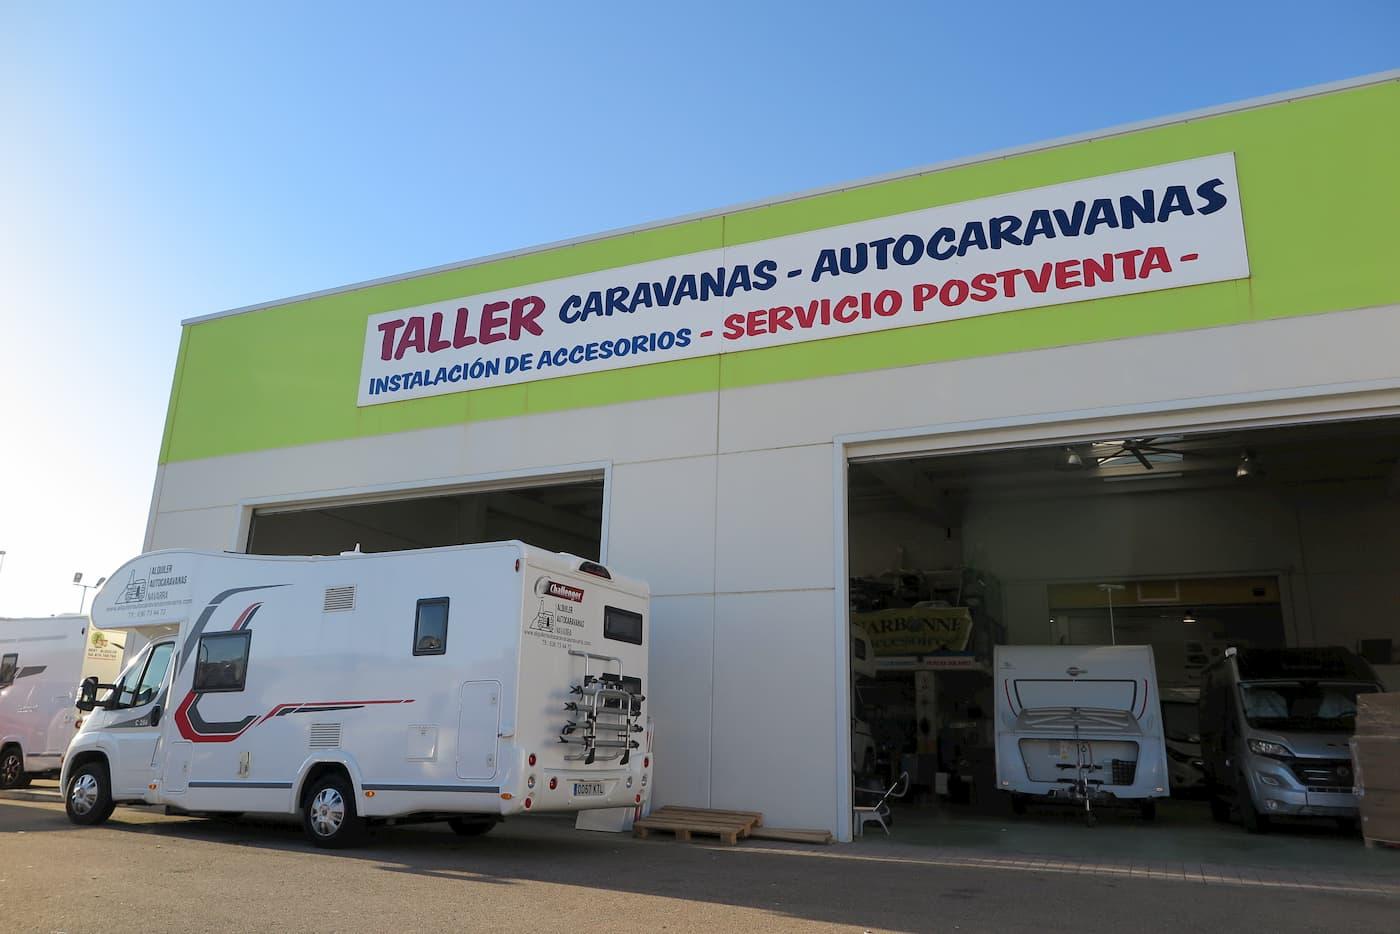 taller de autocaravanas